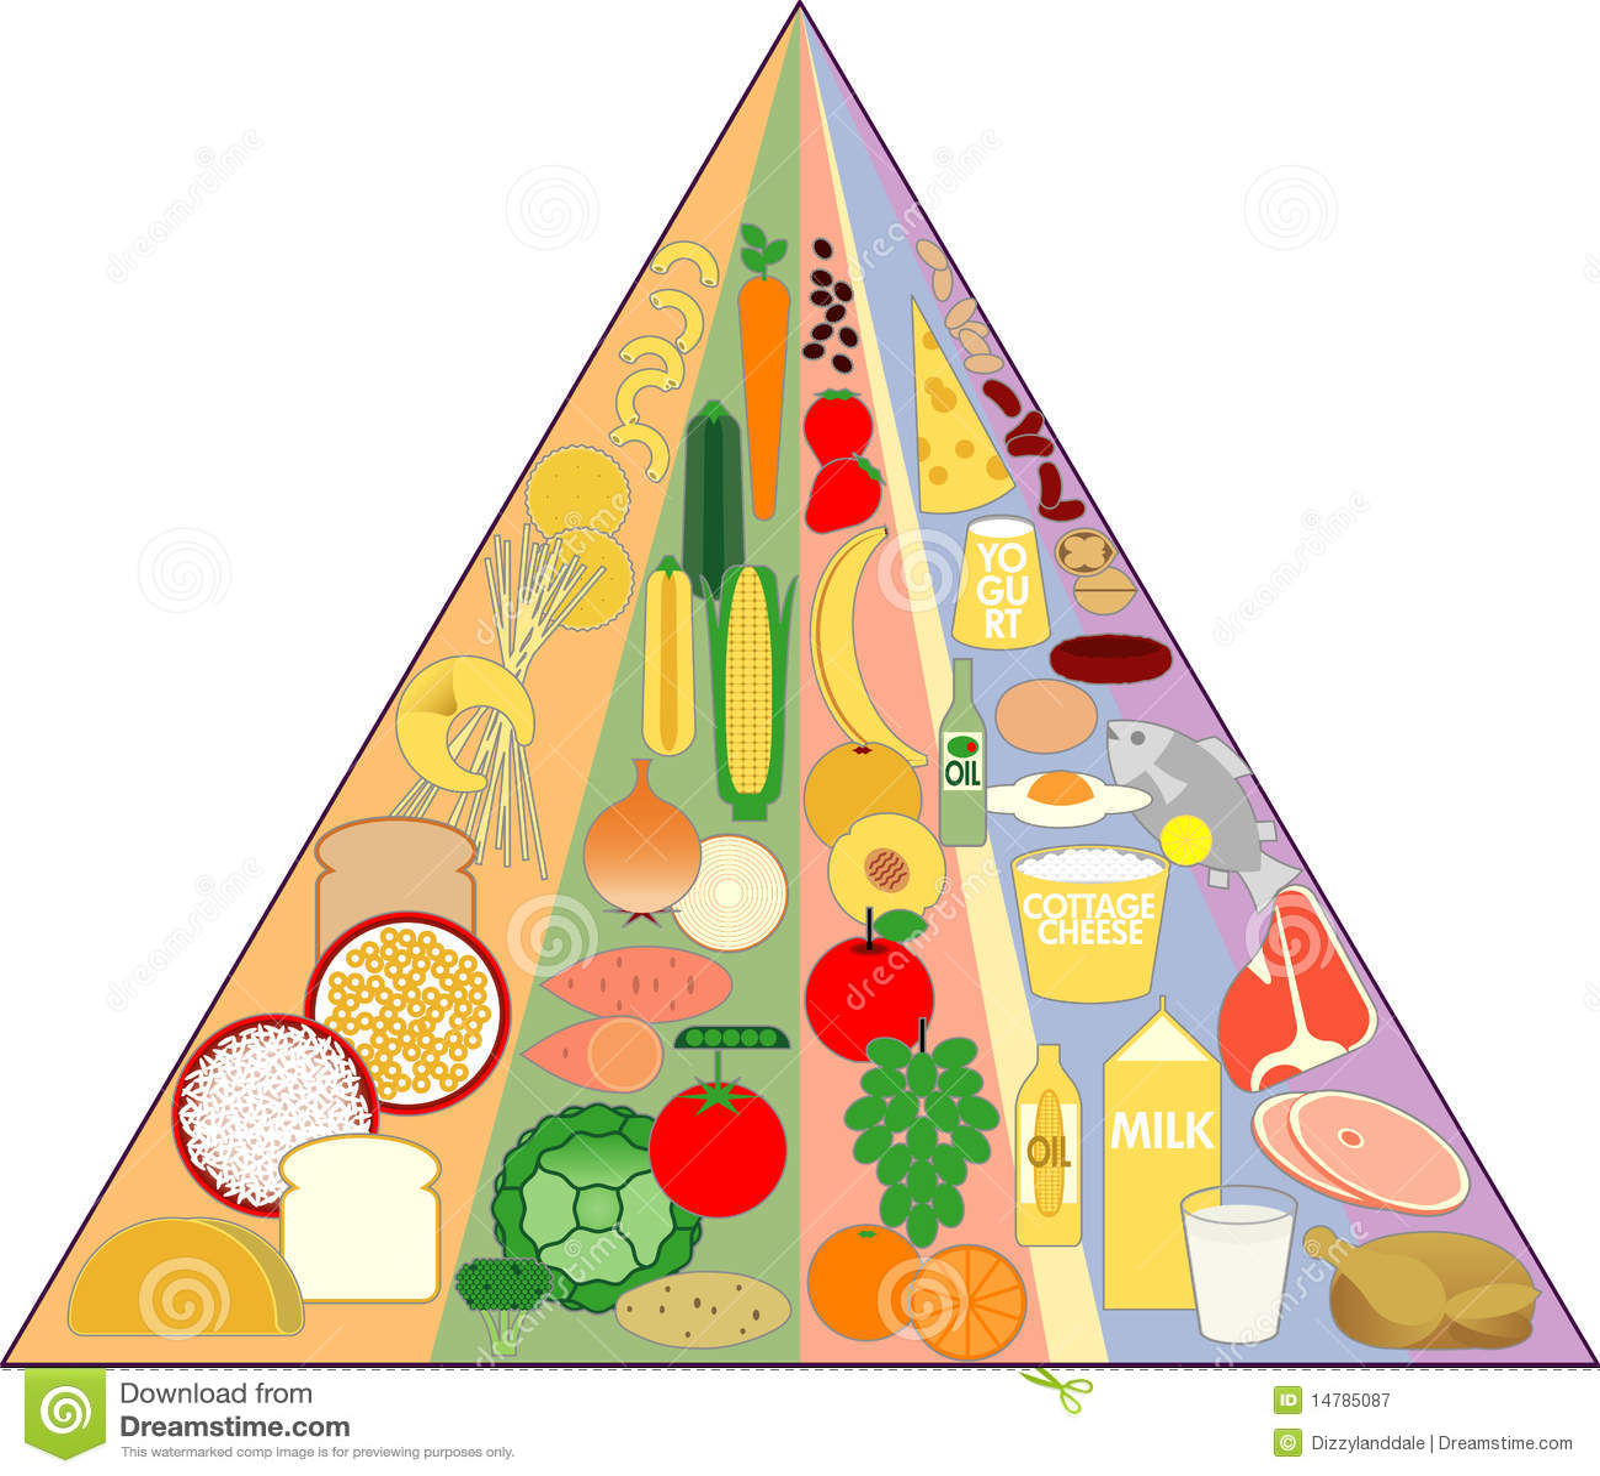 New Food Pyramid Chart Royalty Free Stock Photography